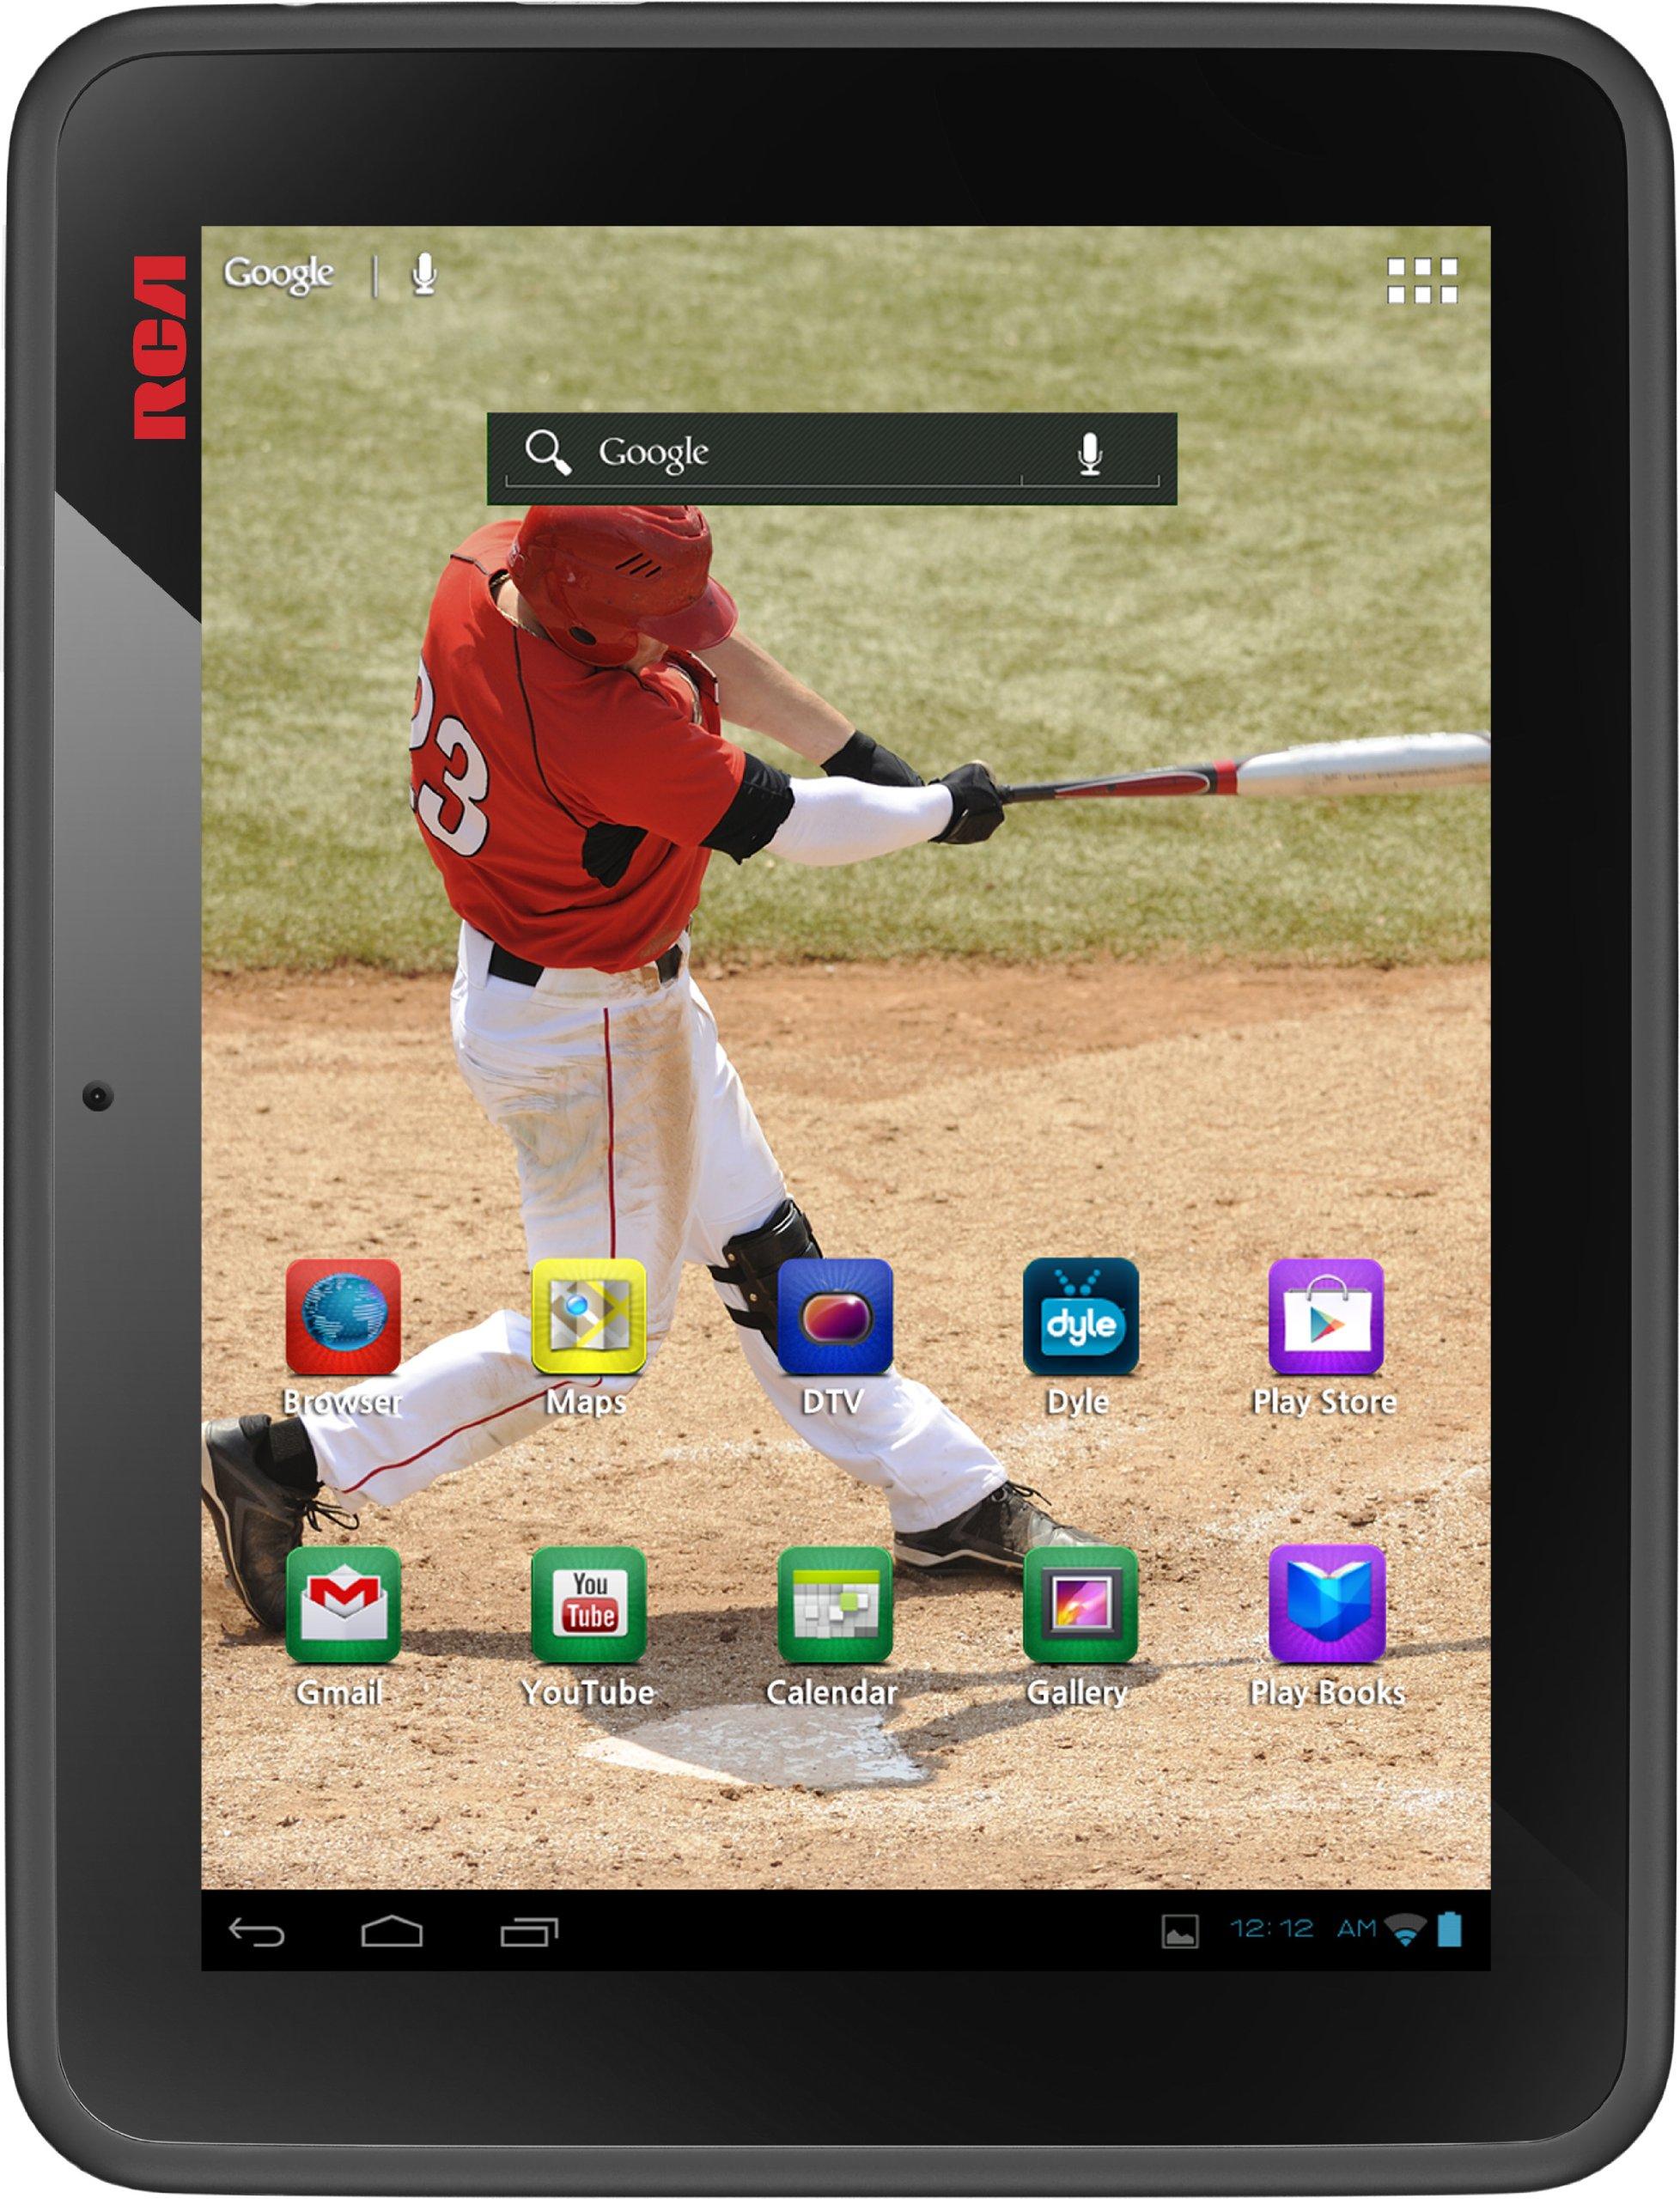 RCA DMT580DU Mobile TV 8 Inch 8GB Tablet (TV app download required)